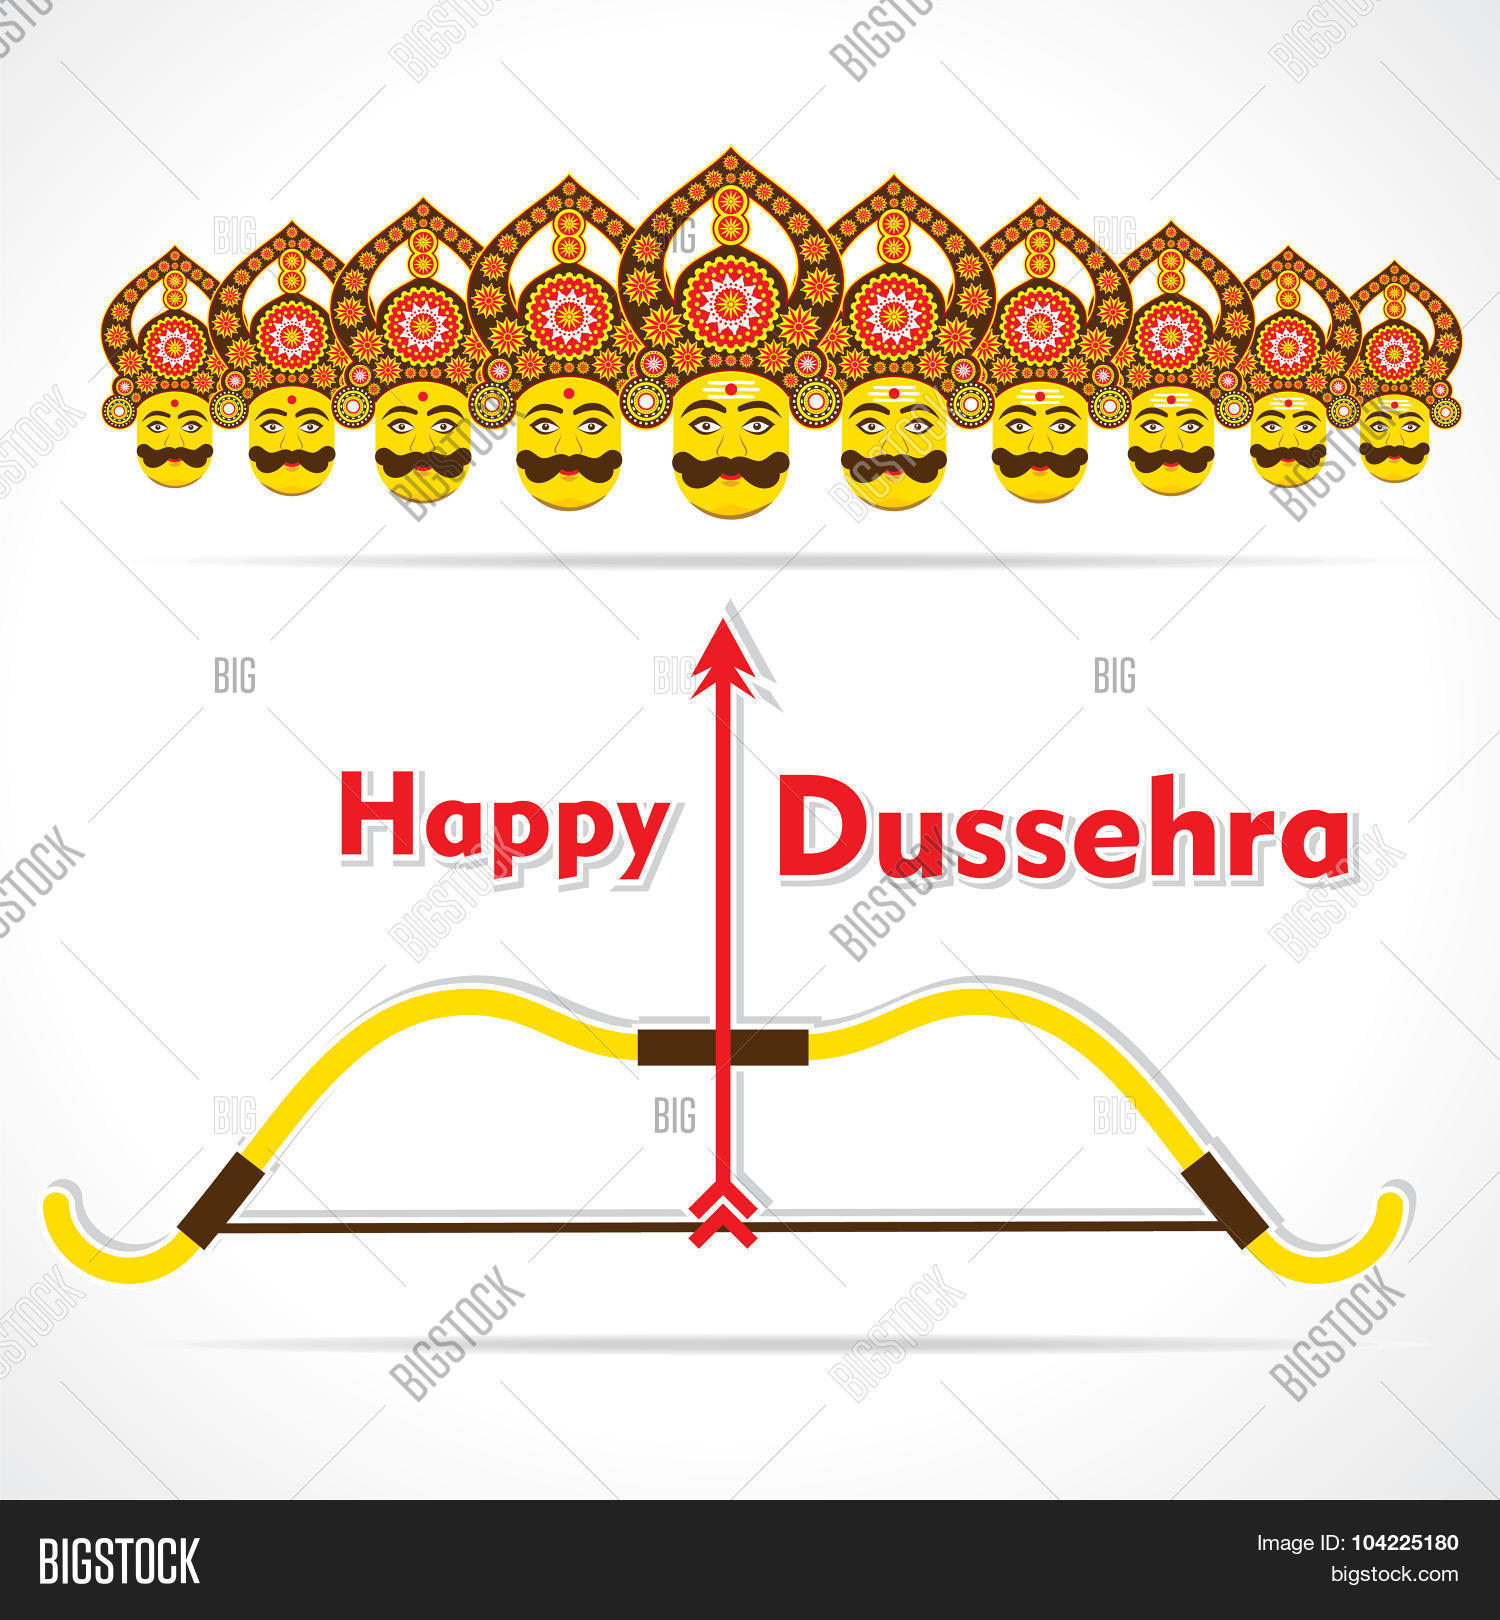 Happy Dussehra Vector Photo Free Trial Bigstock